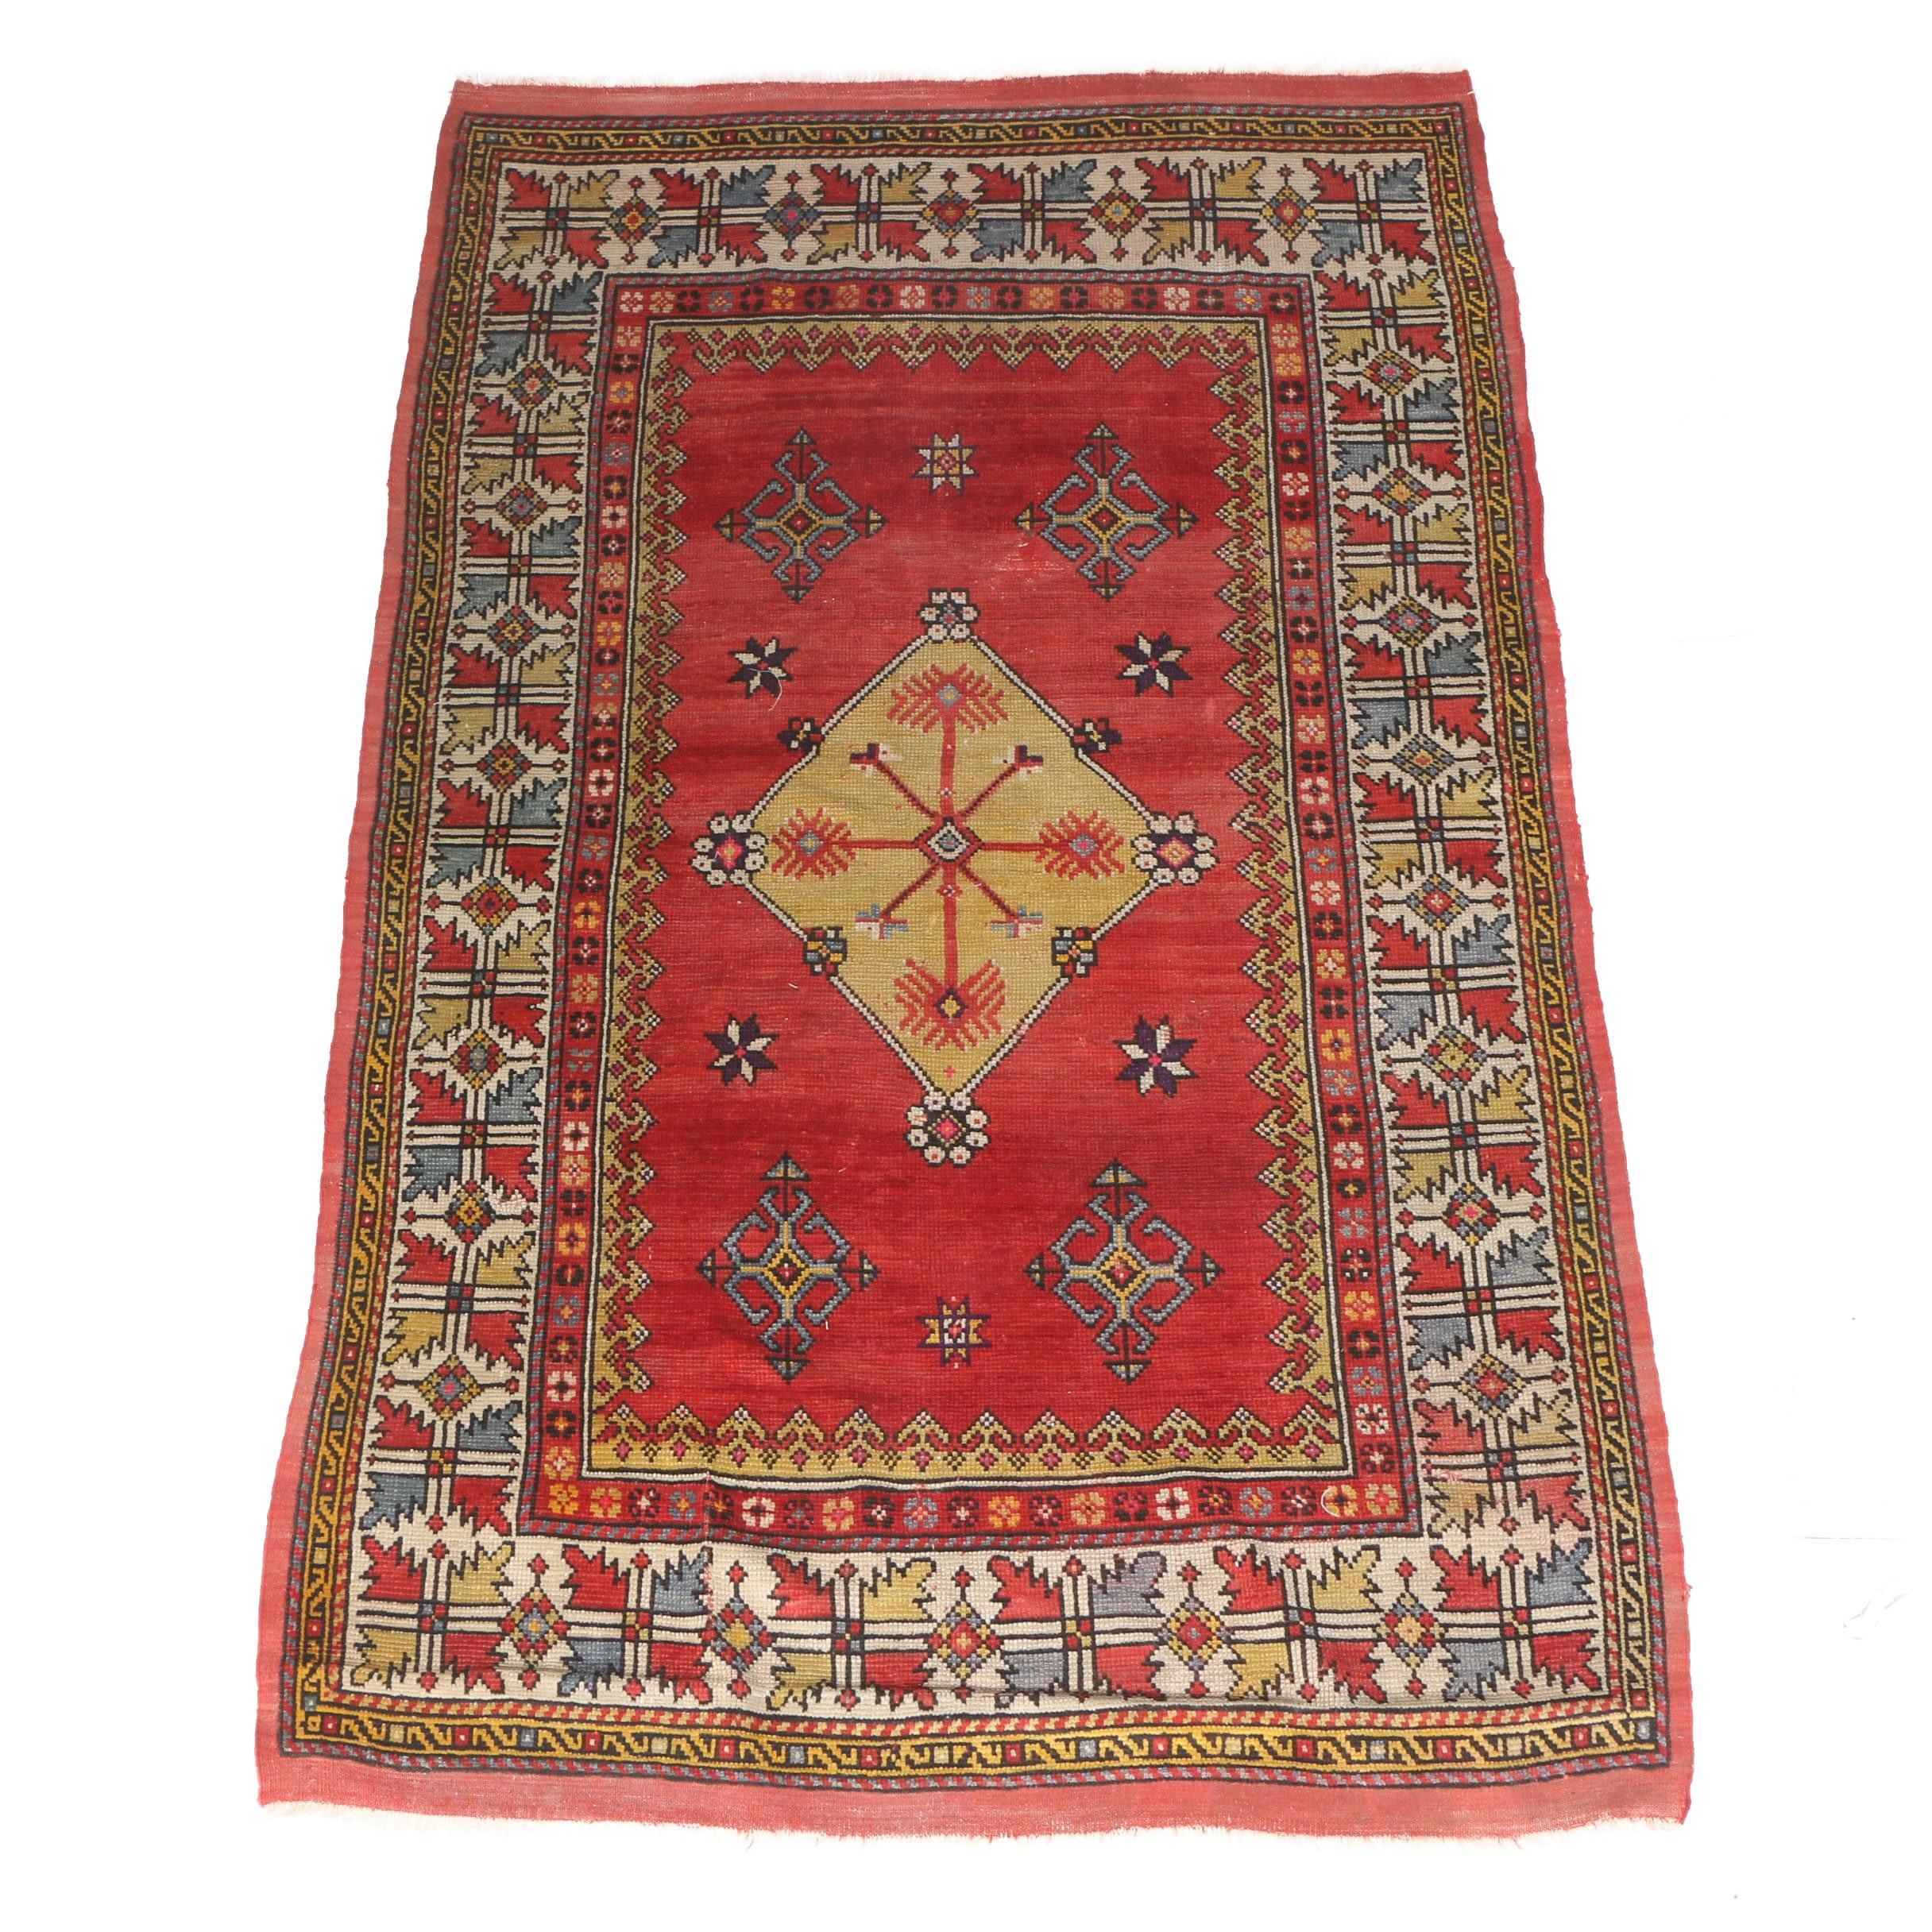 Vintage Handwoven Anatolian Bergama Wool Area Rug